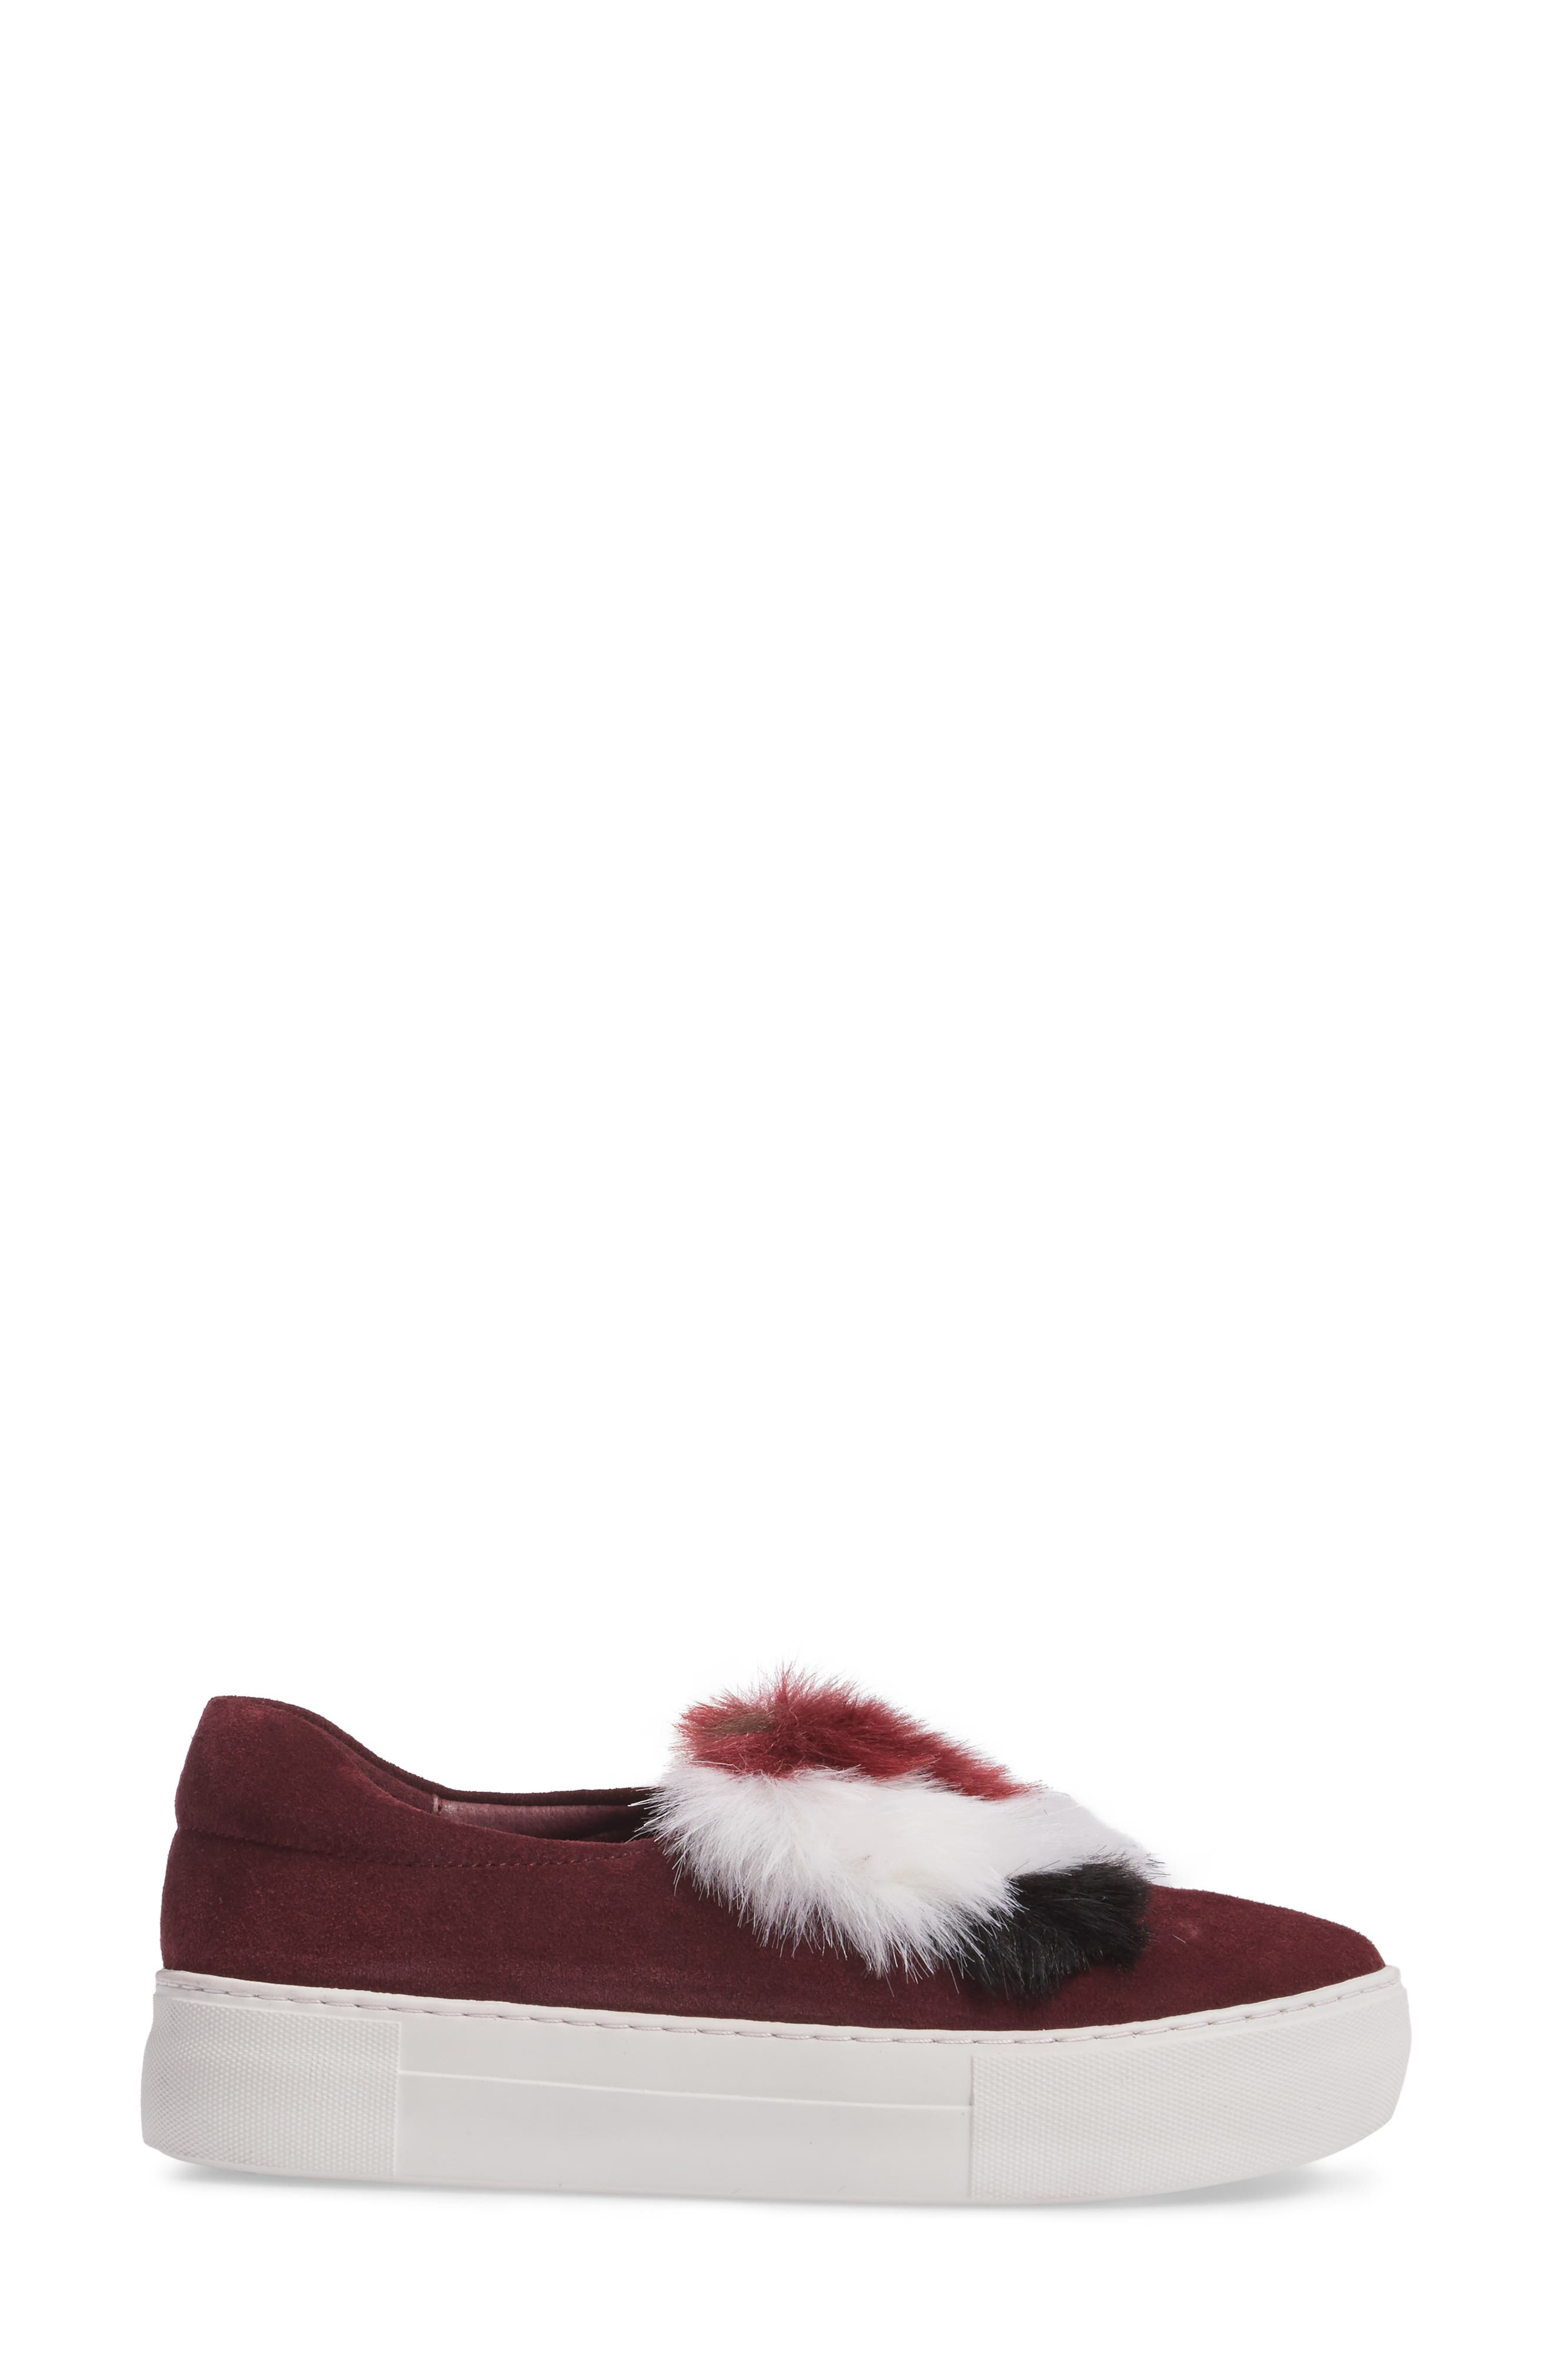 Alexi Faux Fur Slip-On Sneaker,                             Alternate thumbnail 3, color,                             Burgundy Suede